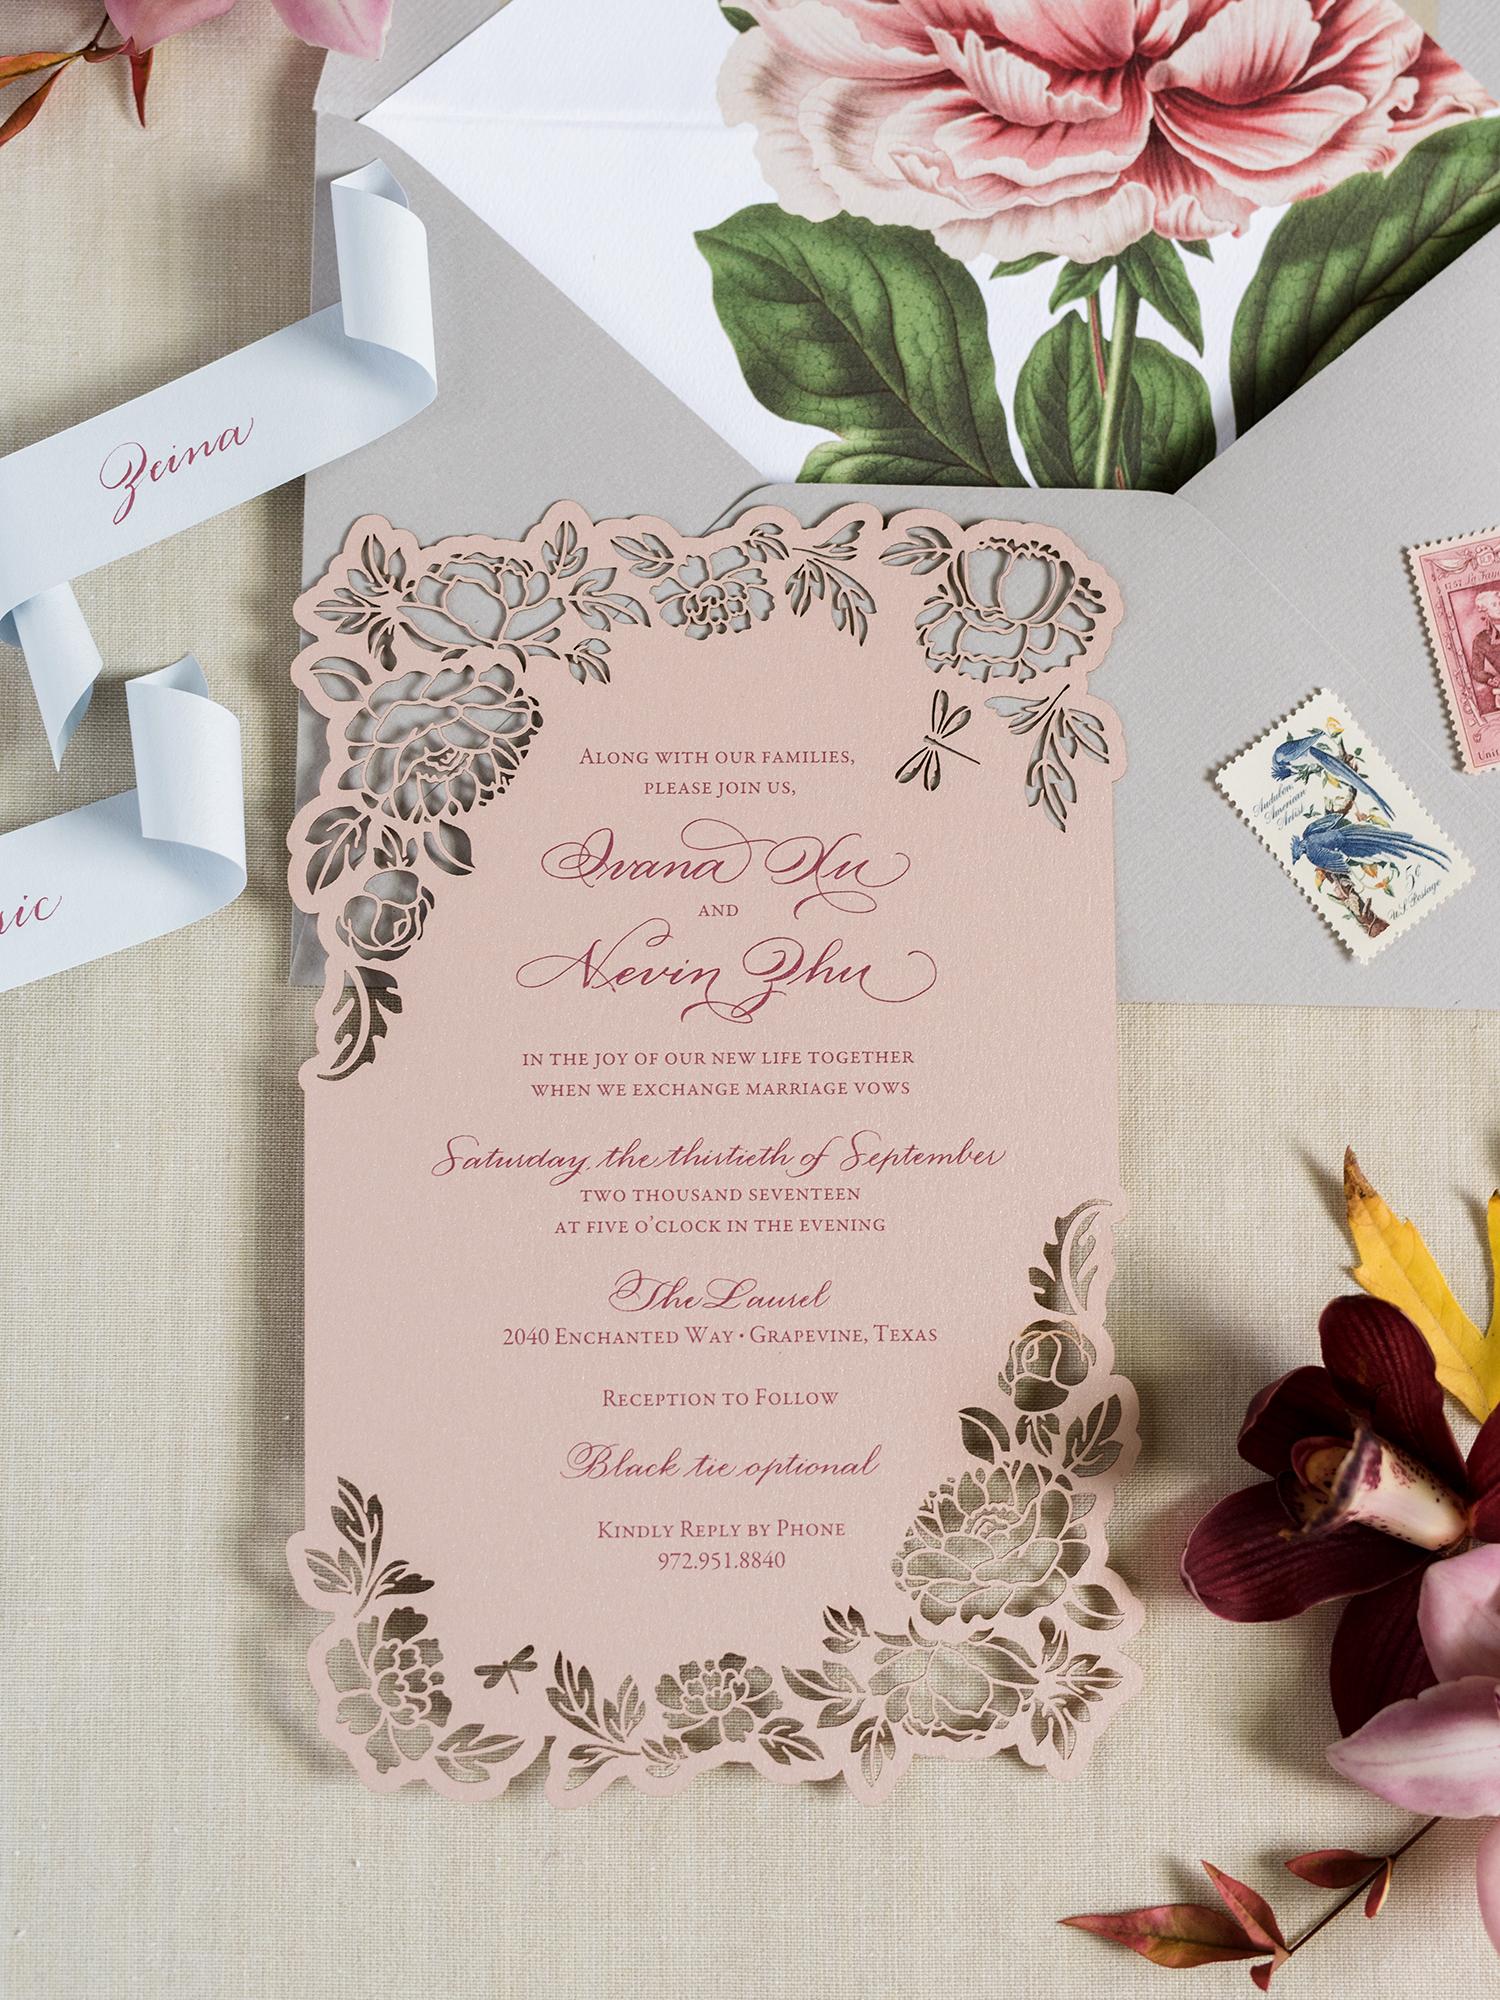 ivana nevin wedding invitation